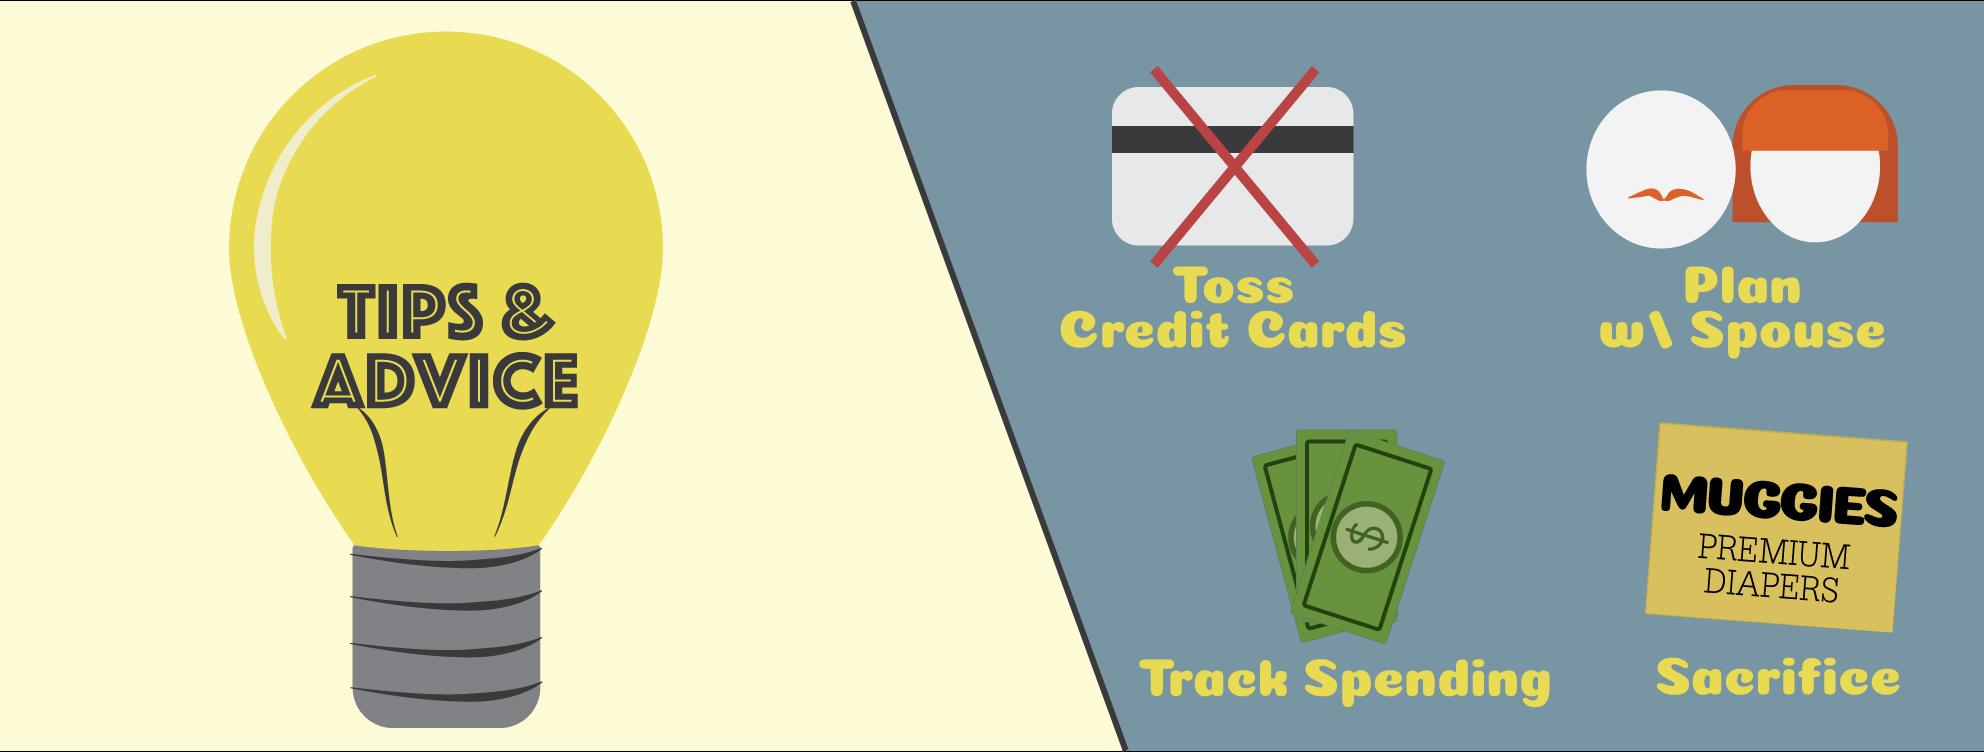 Tips & Advice Debt Free